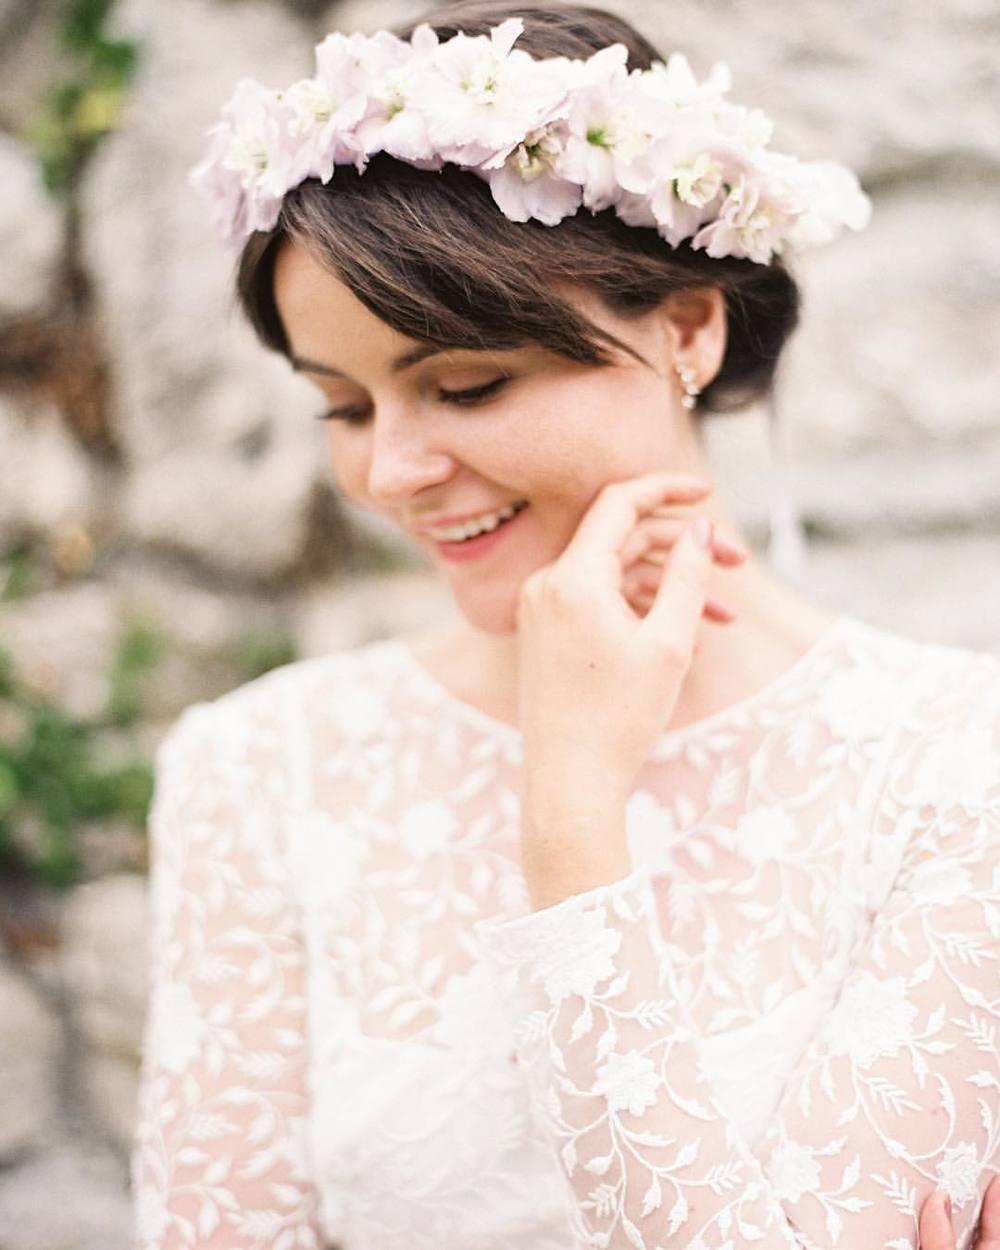 Awww … Isn't she lovely 🌸🌸🌸 flowers are the best accessory! @bowsandarrowsflowers & @kaylabarkerphoto 😘 #tatyanamerenyuk #tatyanamerenyukbridal #fashion #style #stylish #cute #tatyanamerenyukbridal #hair #beauty #beautiful #pretty #design #bridaldress #dress #wedding #weddingdress #bohochick #boho #whitedress #weddinginsporation #lace #bohemianwedding #bride #nycdesigner #brooklyndesigner #bridal #brooklynbride